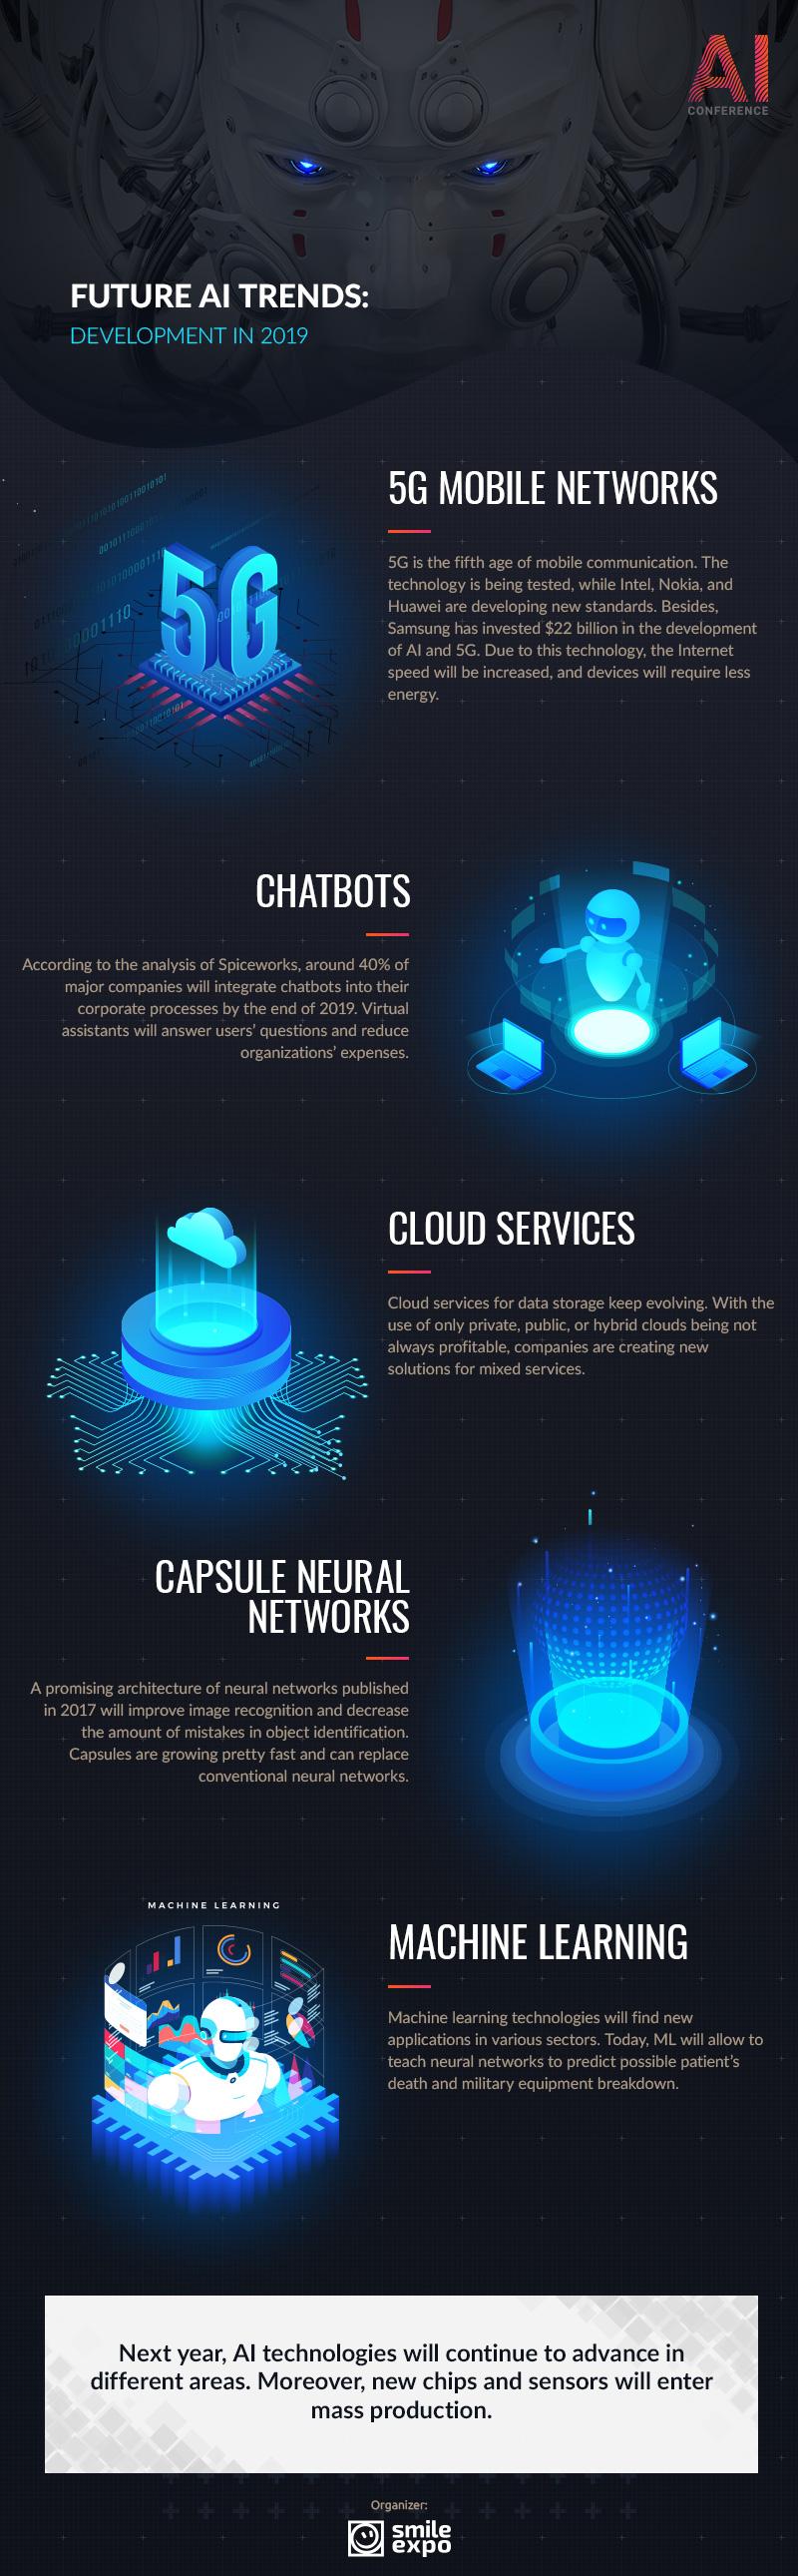 Future AI trends: development in 2019